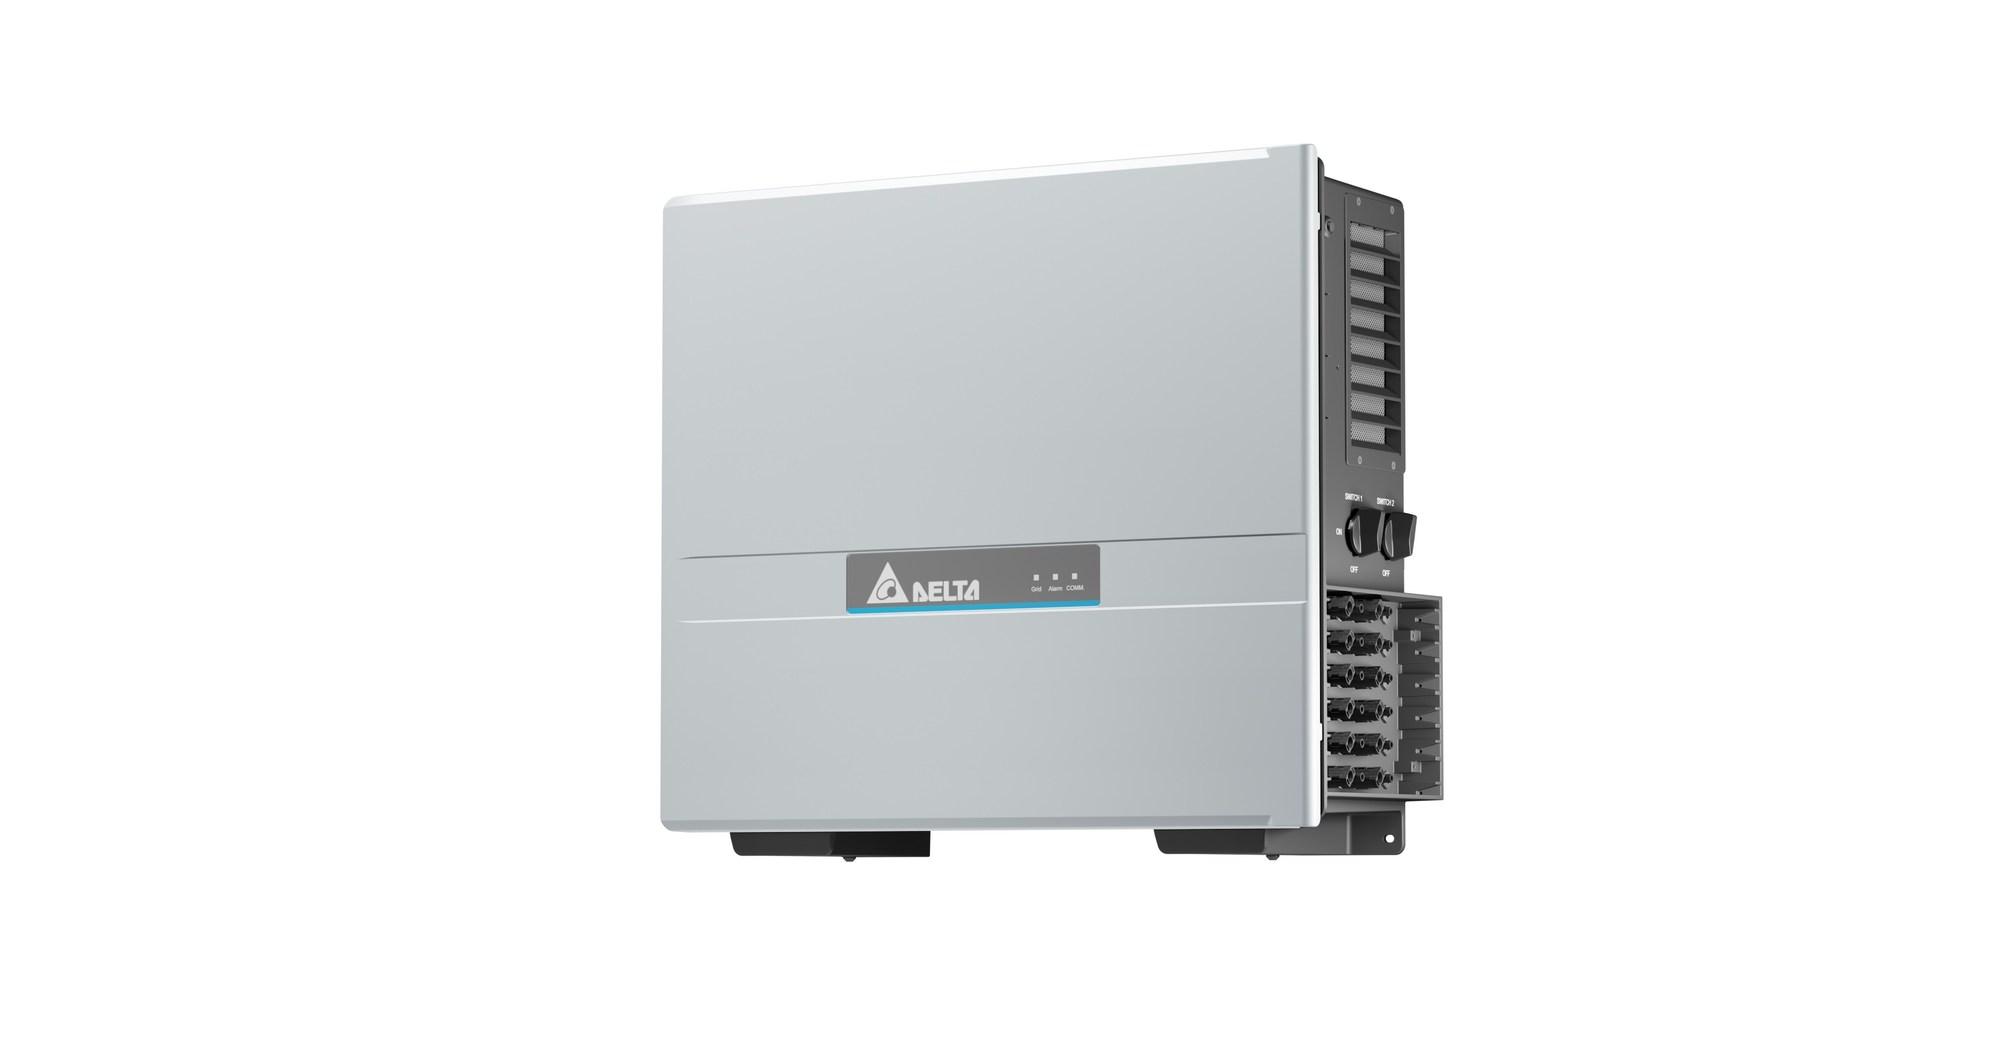 Delta's new generation three-phase M50A Flex solar inverter offers more flexibility in system design - PRNewswire